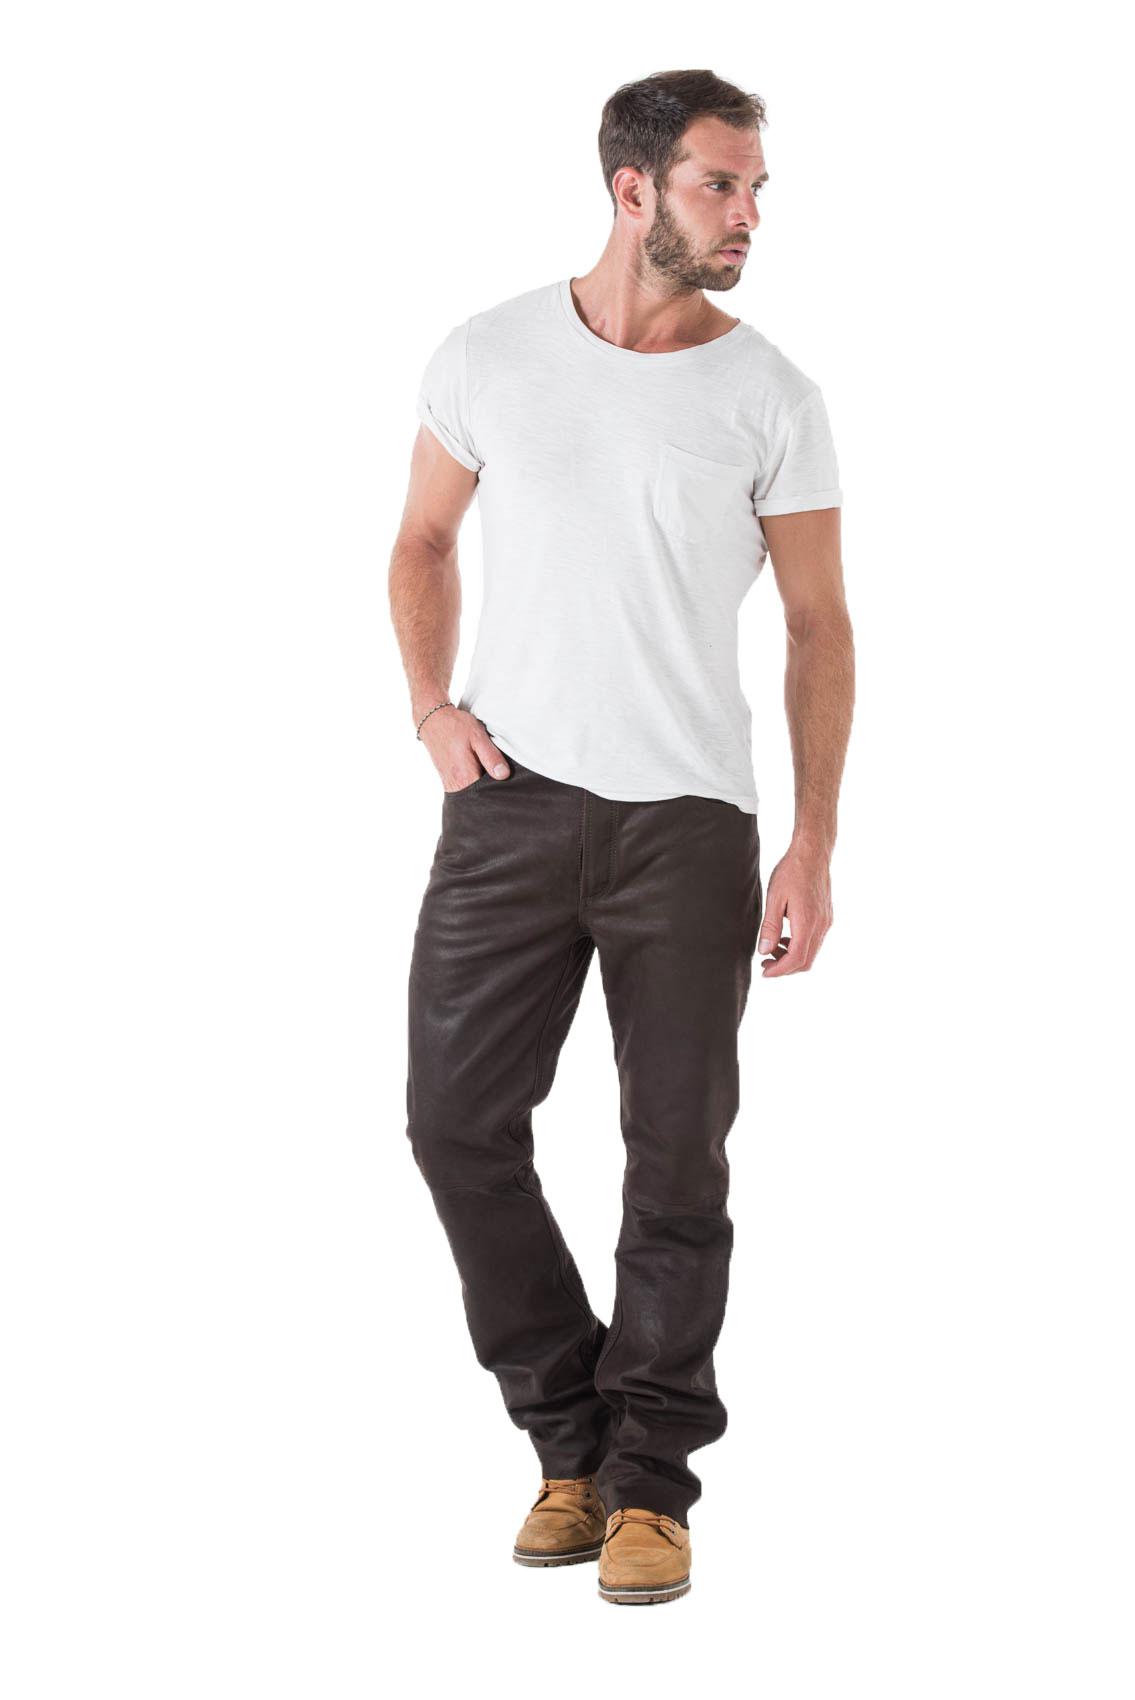 Vêtement en cuir Pantalons cuir marron